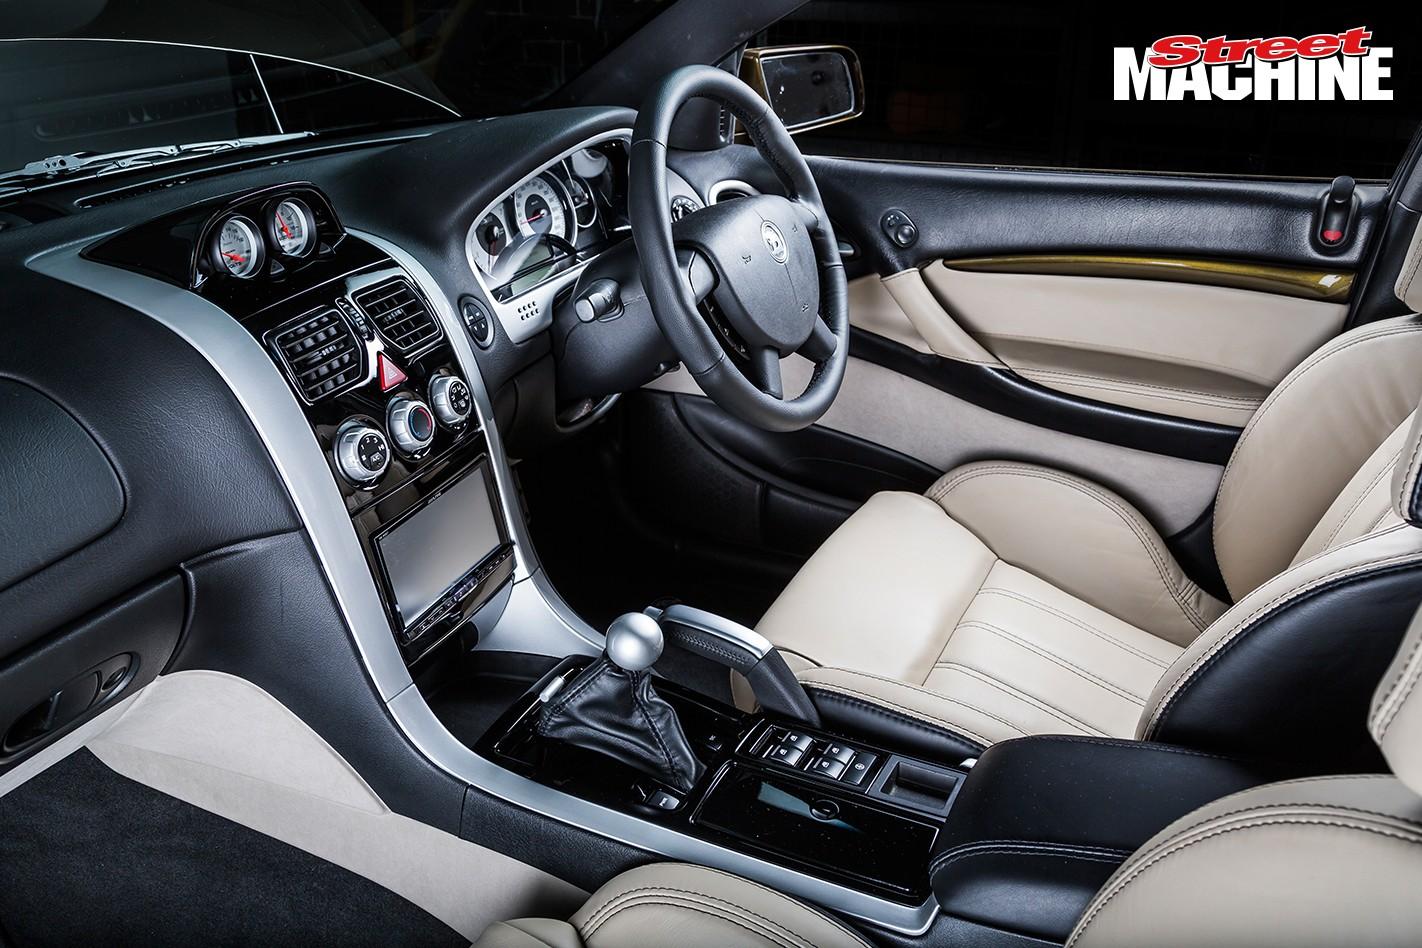 Turbo VY Commodore KINGGM 18 Nw